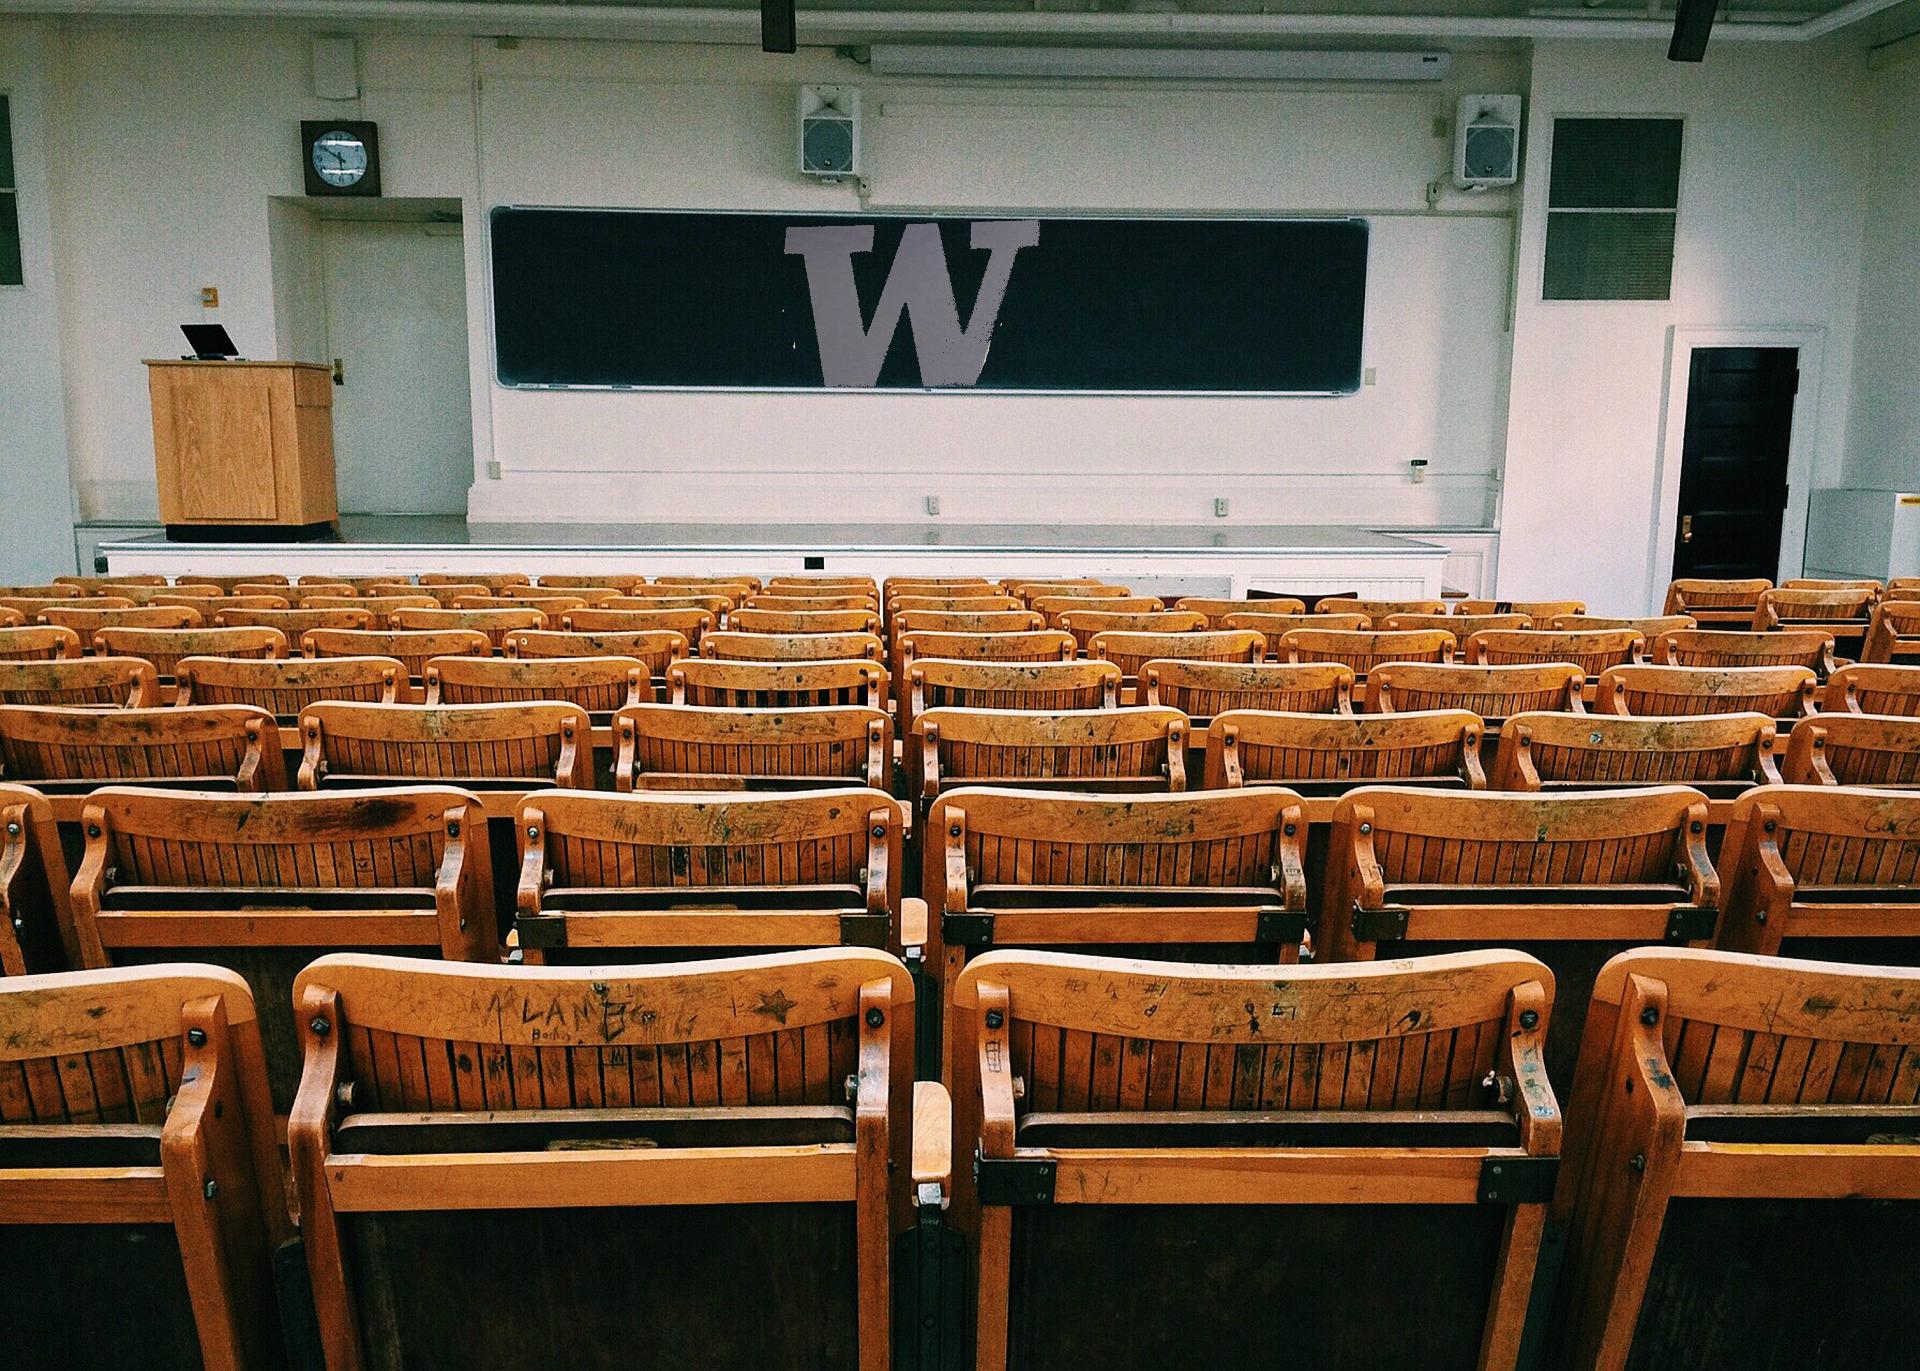 classroom-w.jpg